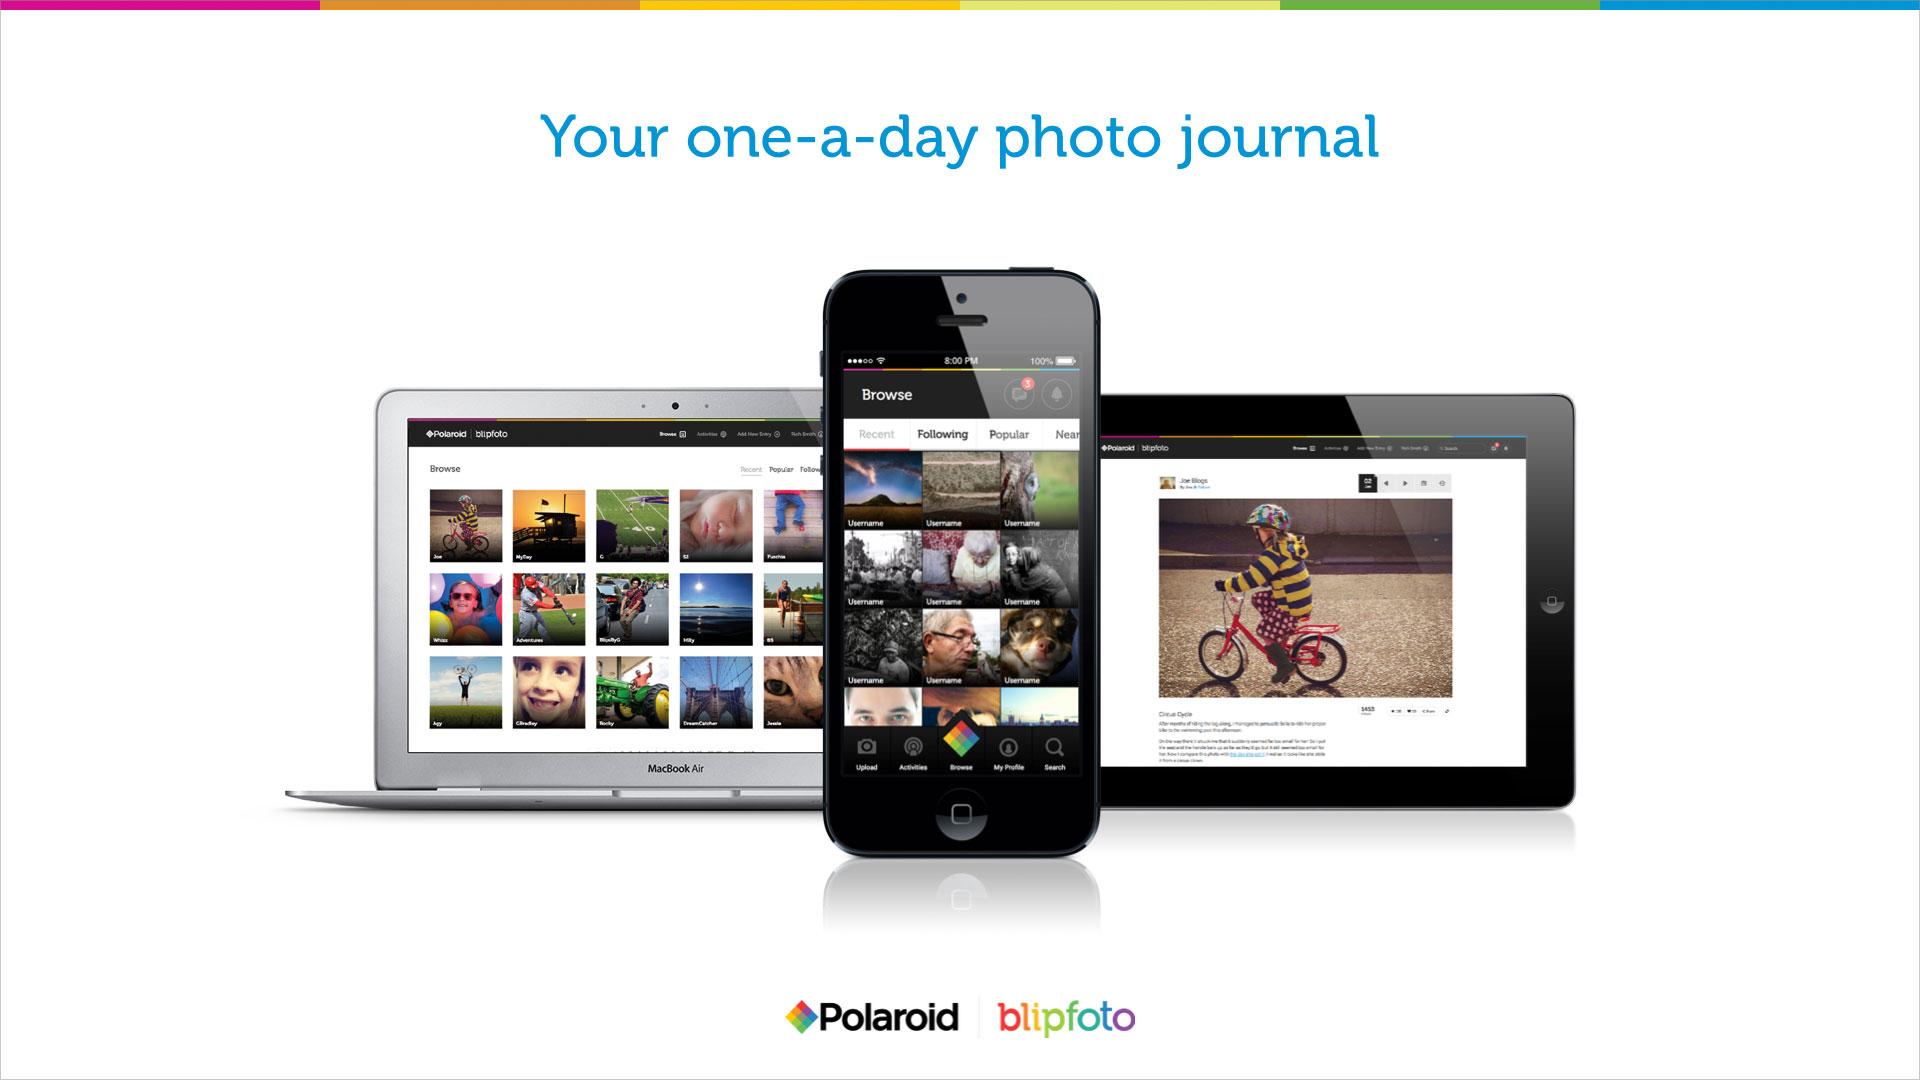 Polaroid Blipfoto